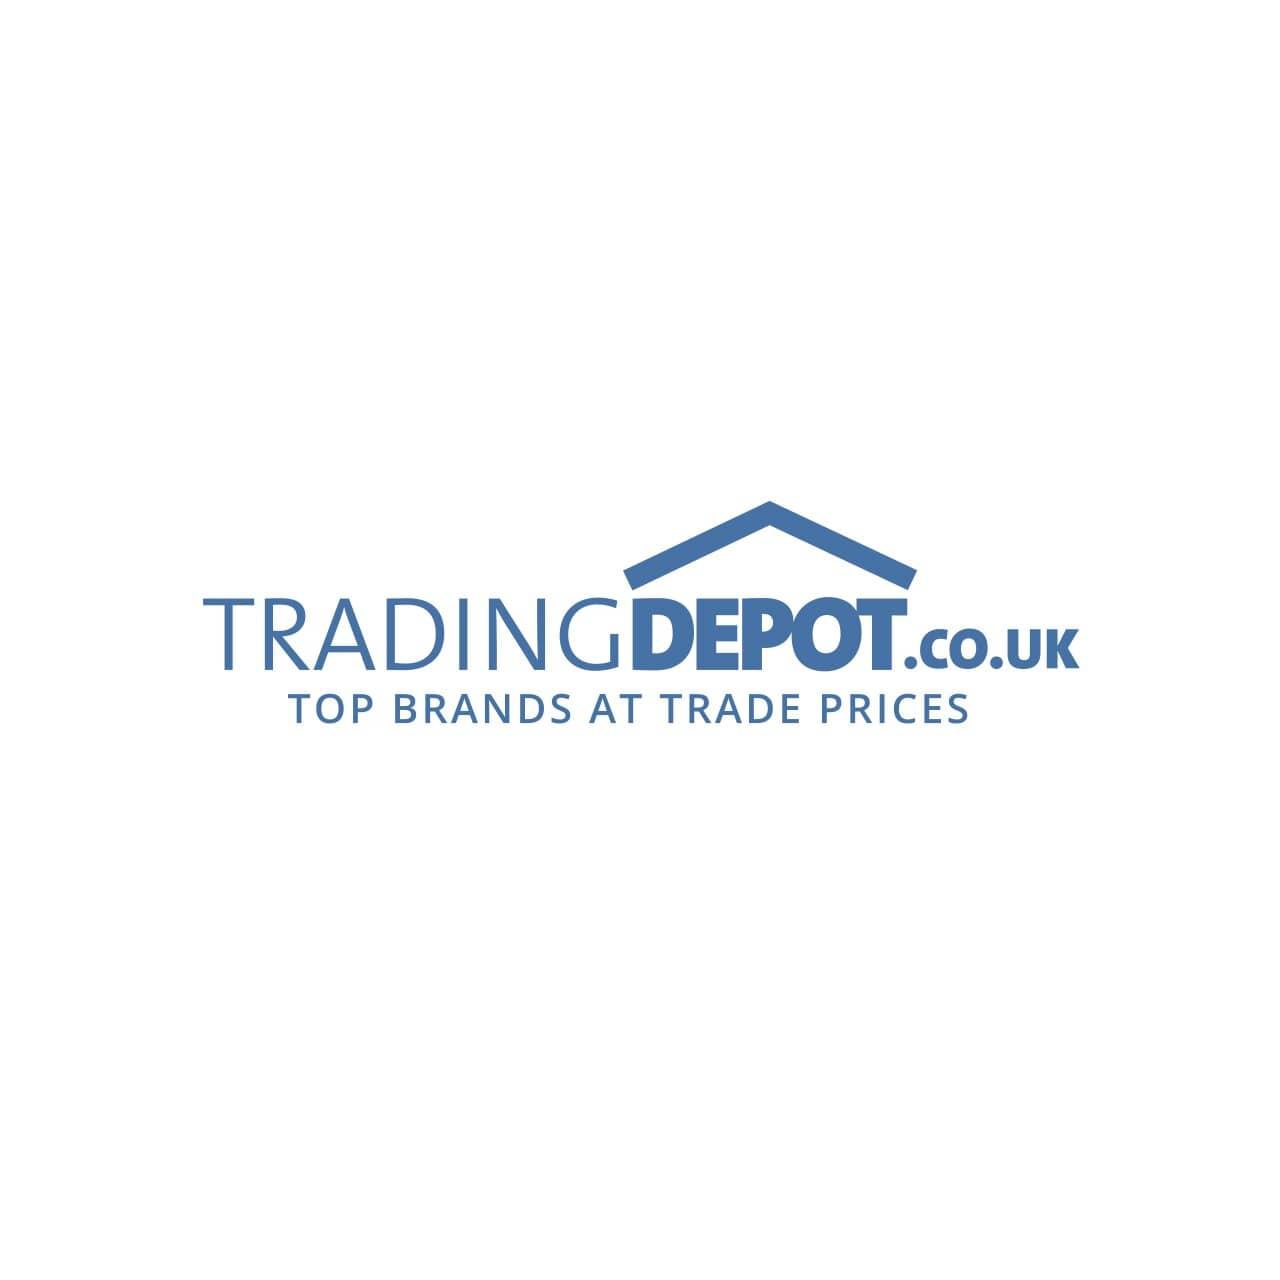 April Waifer Gloss White Tray 1700x900 - 5706/000